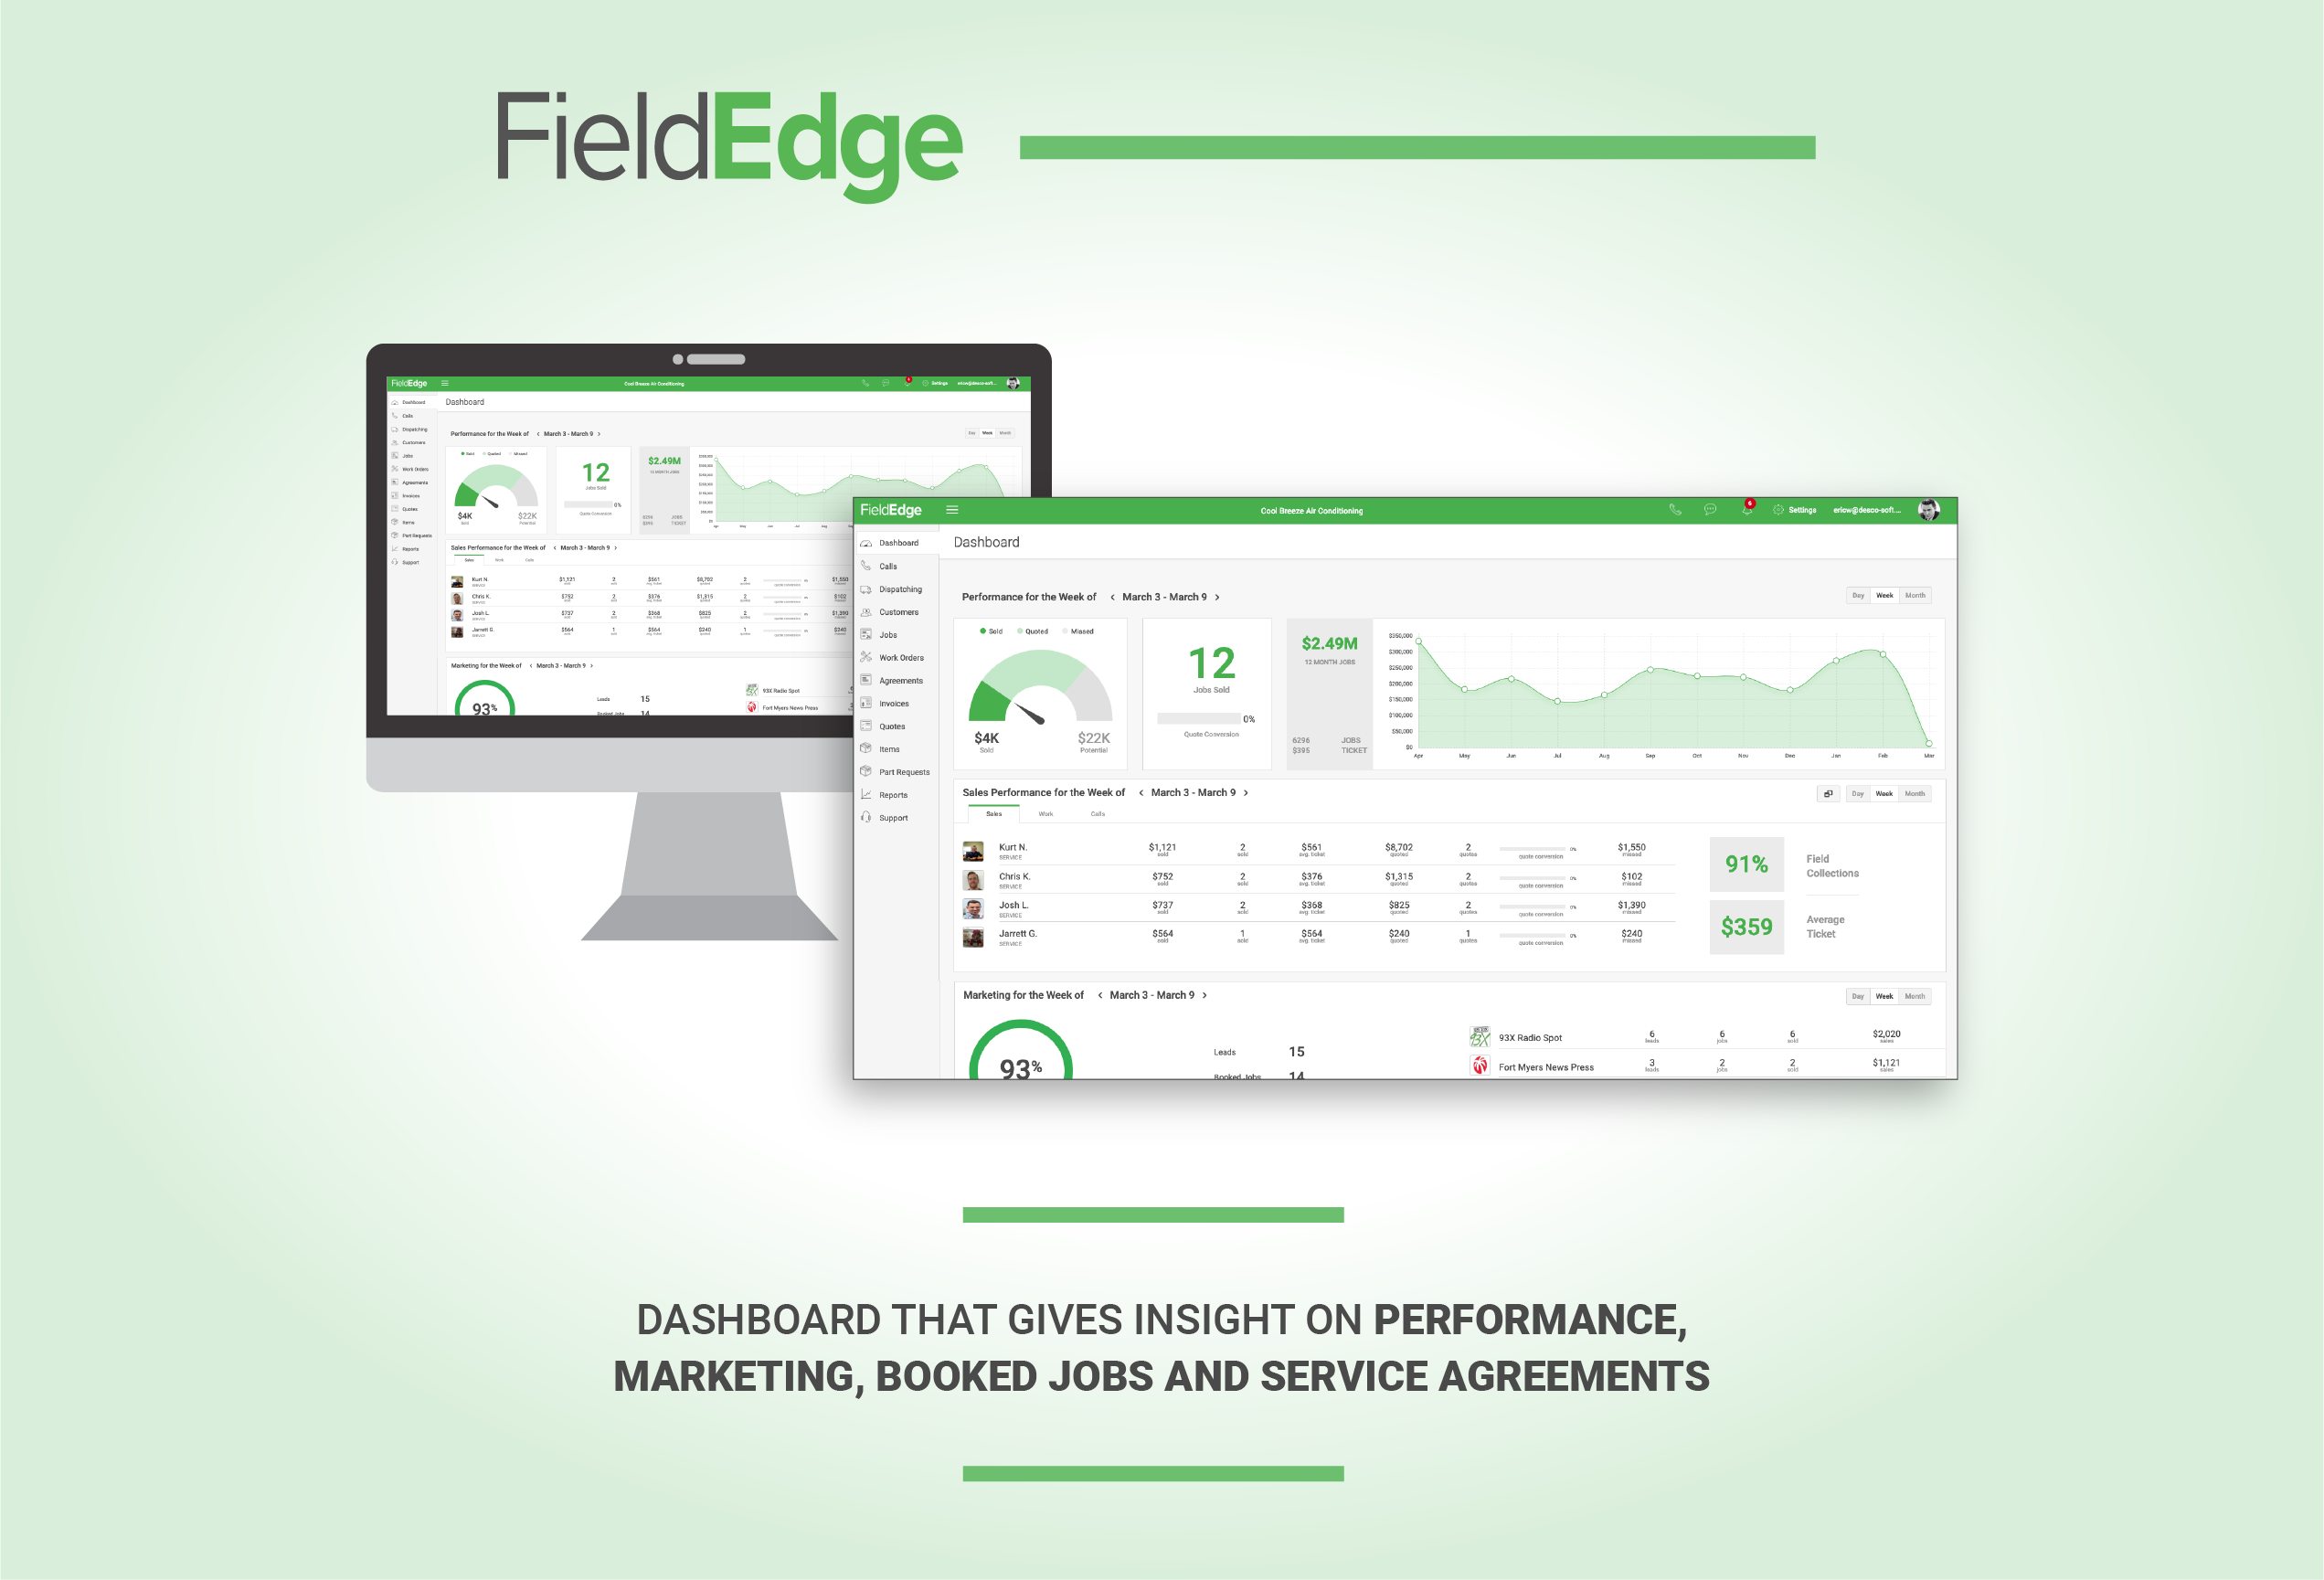 FieldEdge screenshot